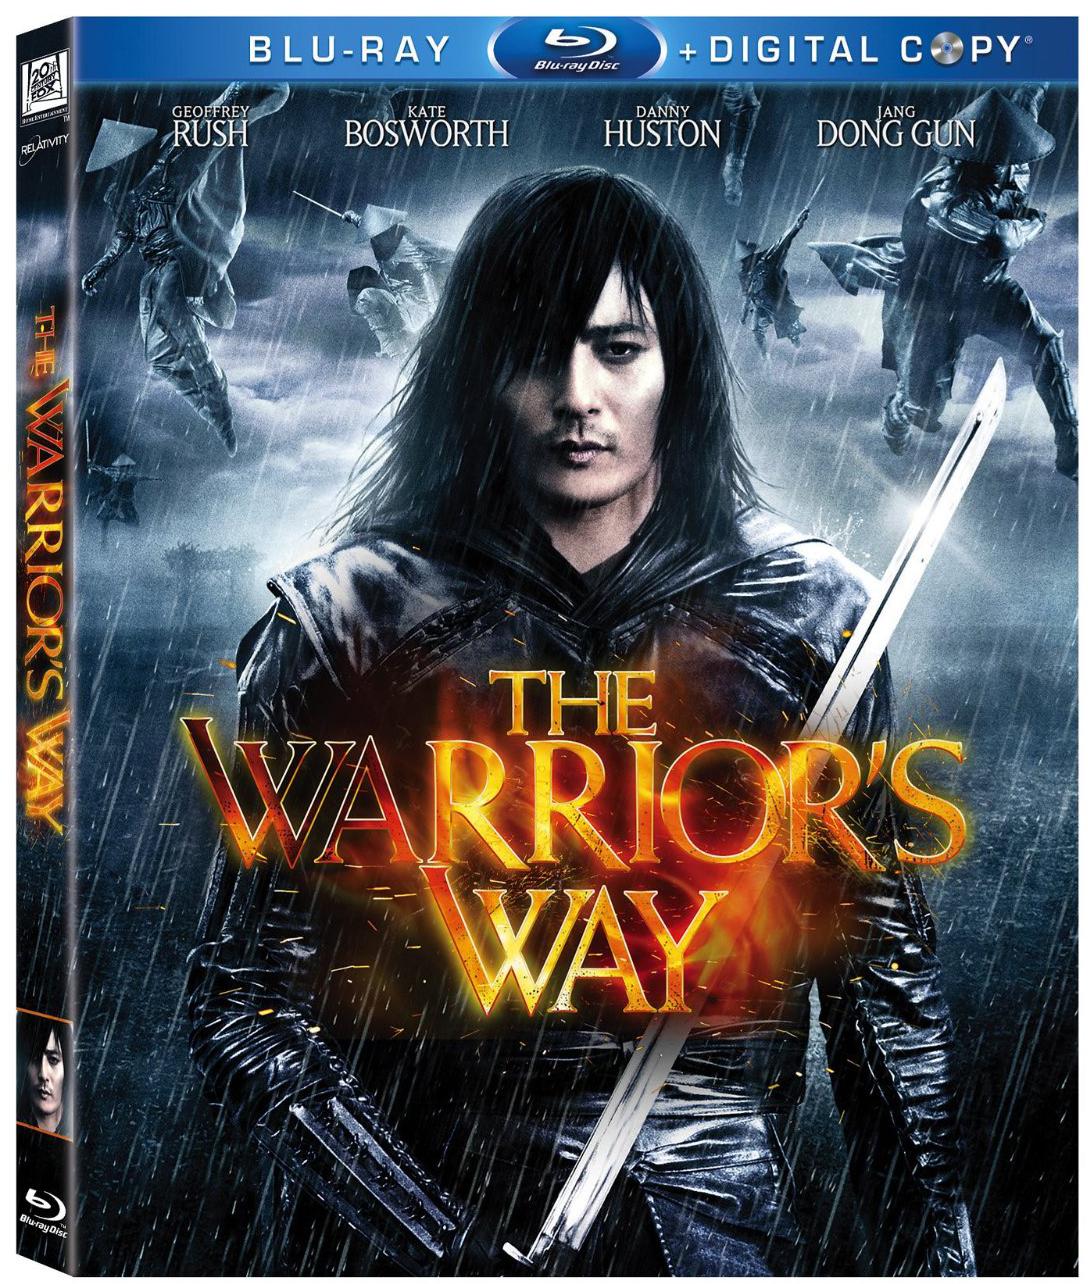 The Warriors Gate Full Movie Dual Audio: The Warrior's Way Blu-ray/DVD (Fox)